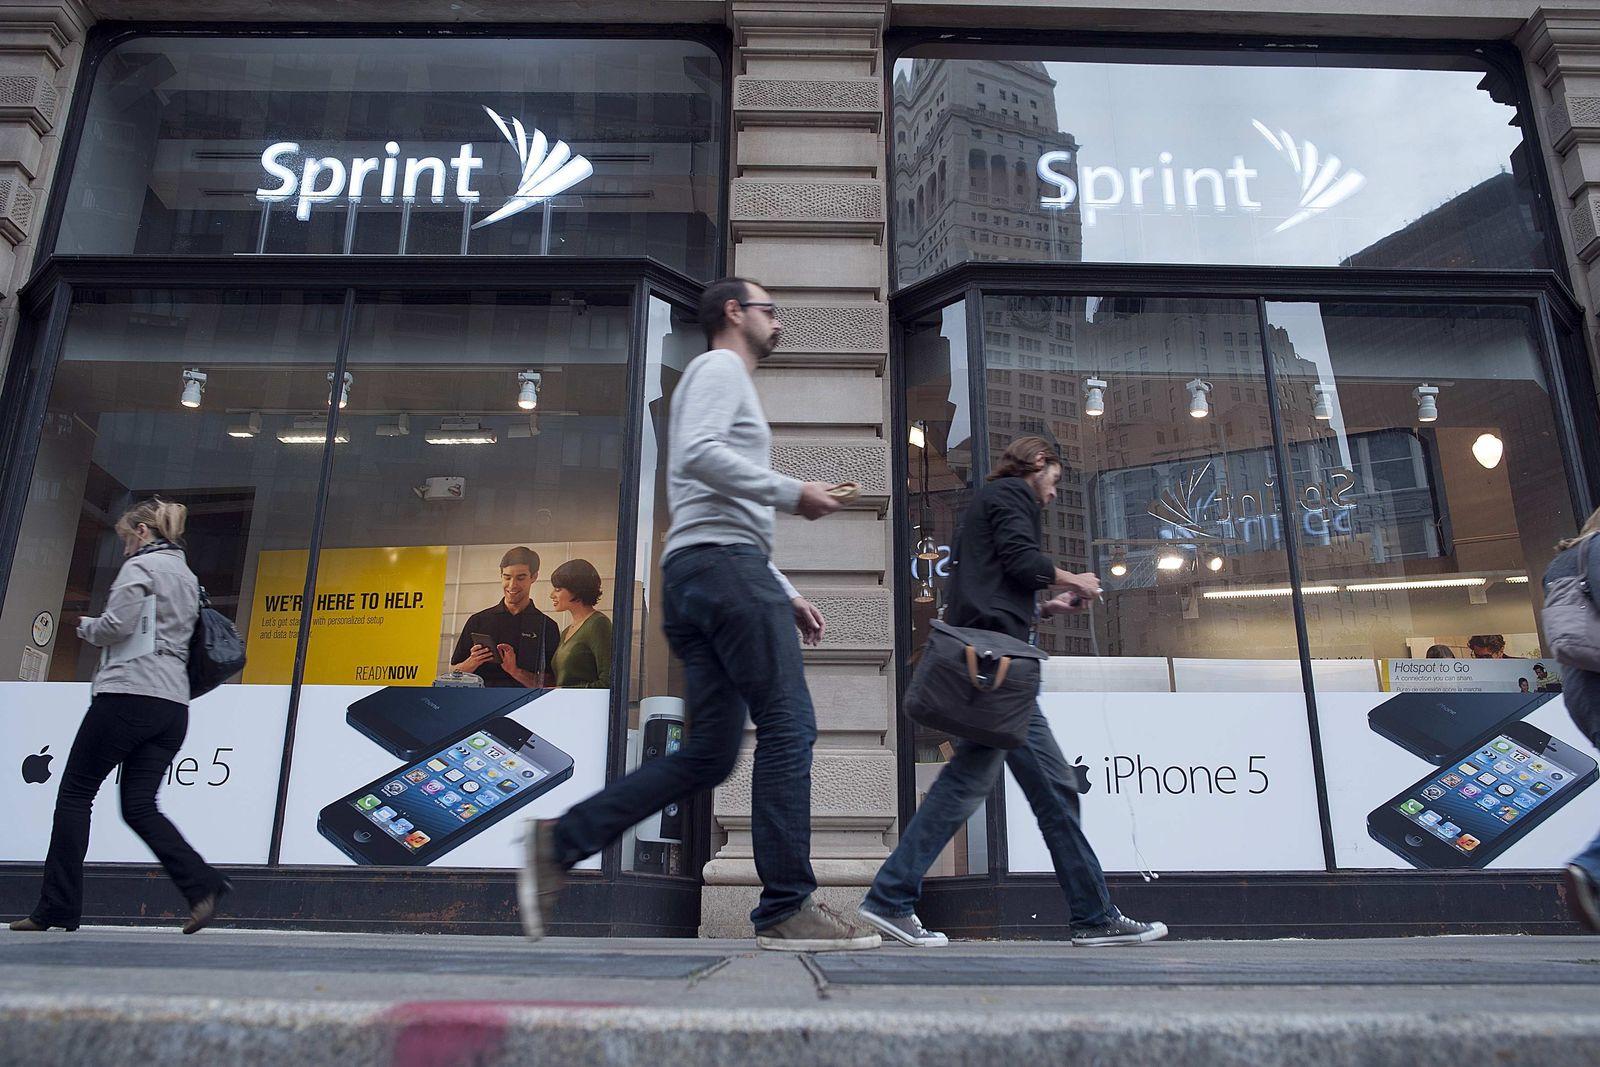 USA / Sprint / Mobilfunk